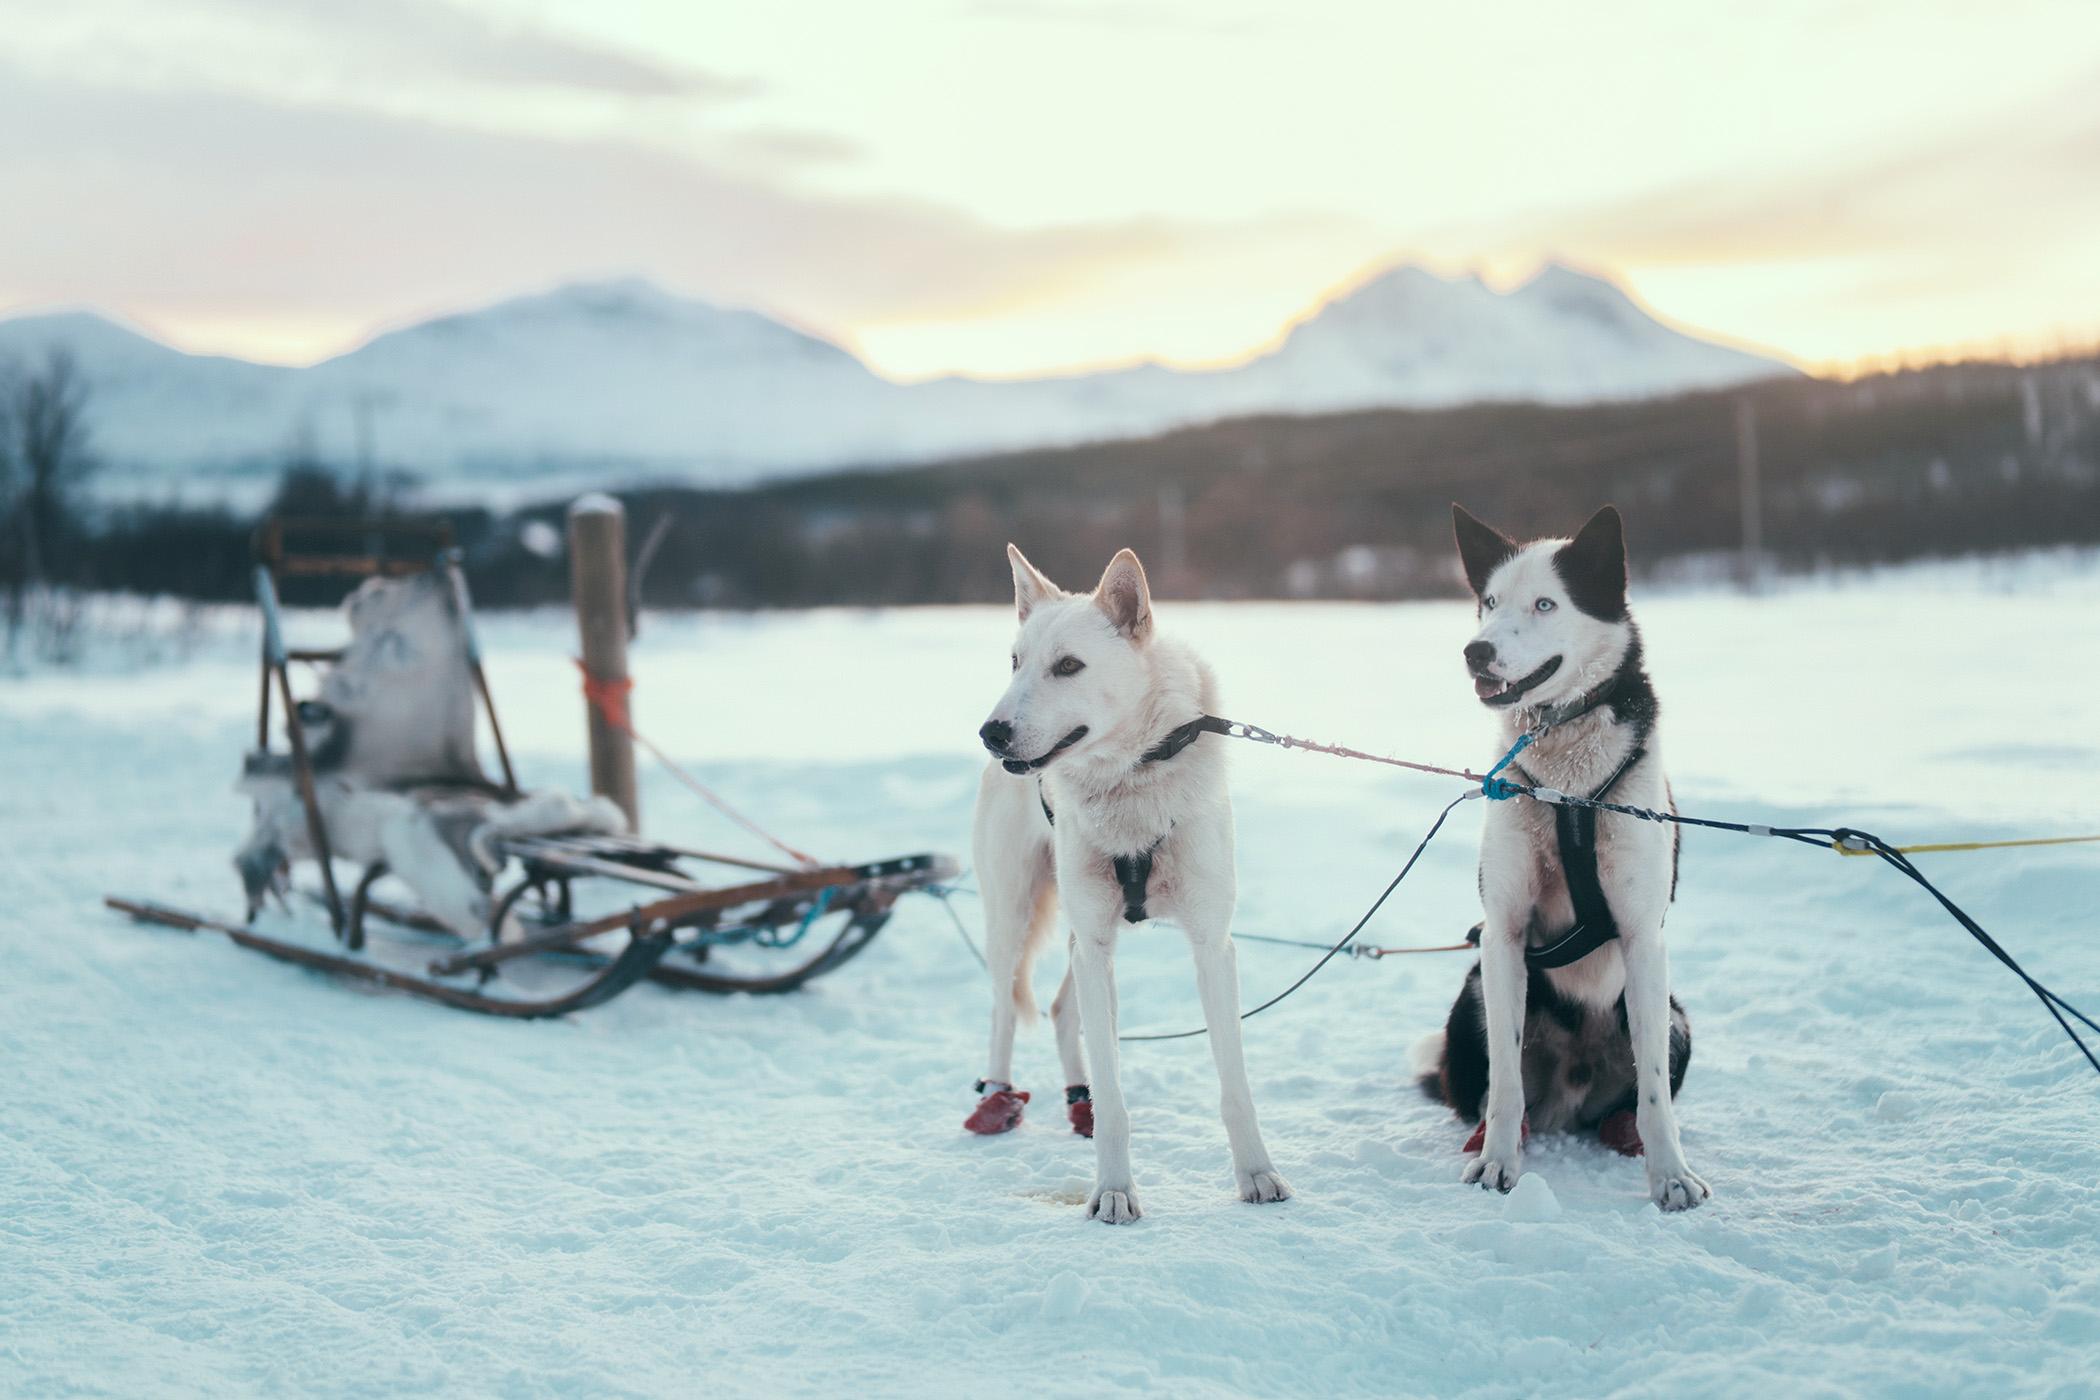 Sledding dogs